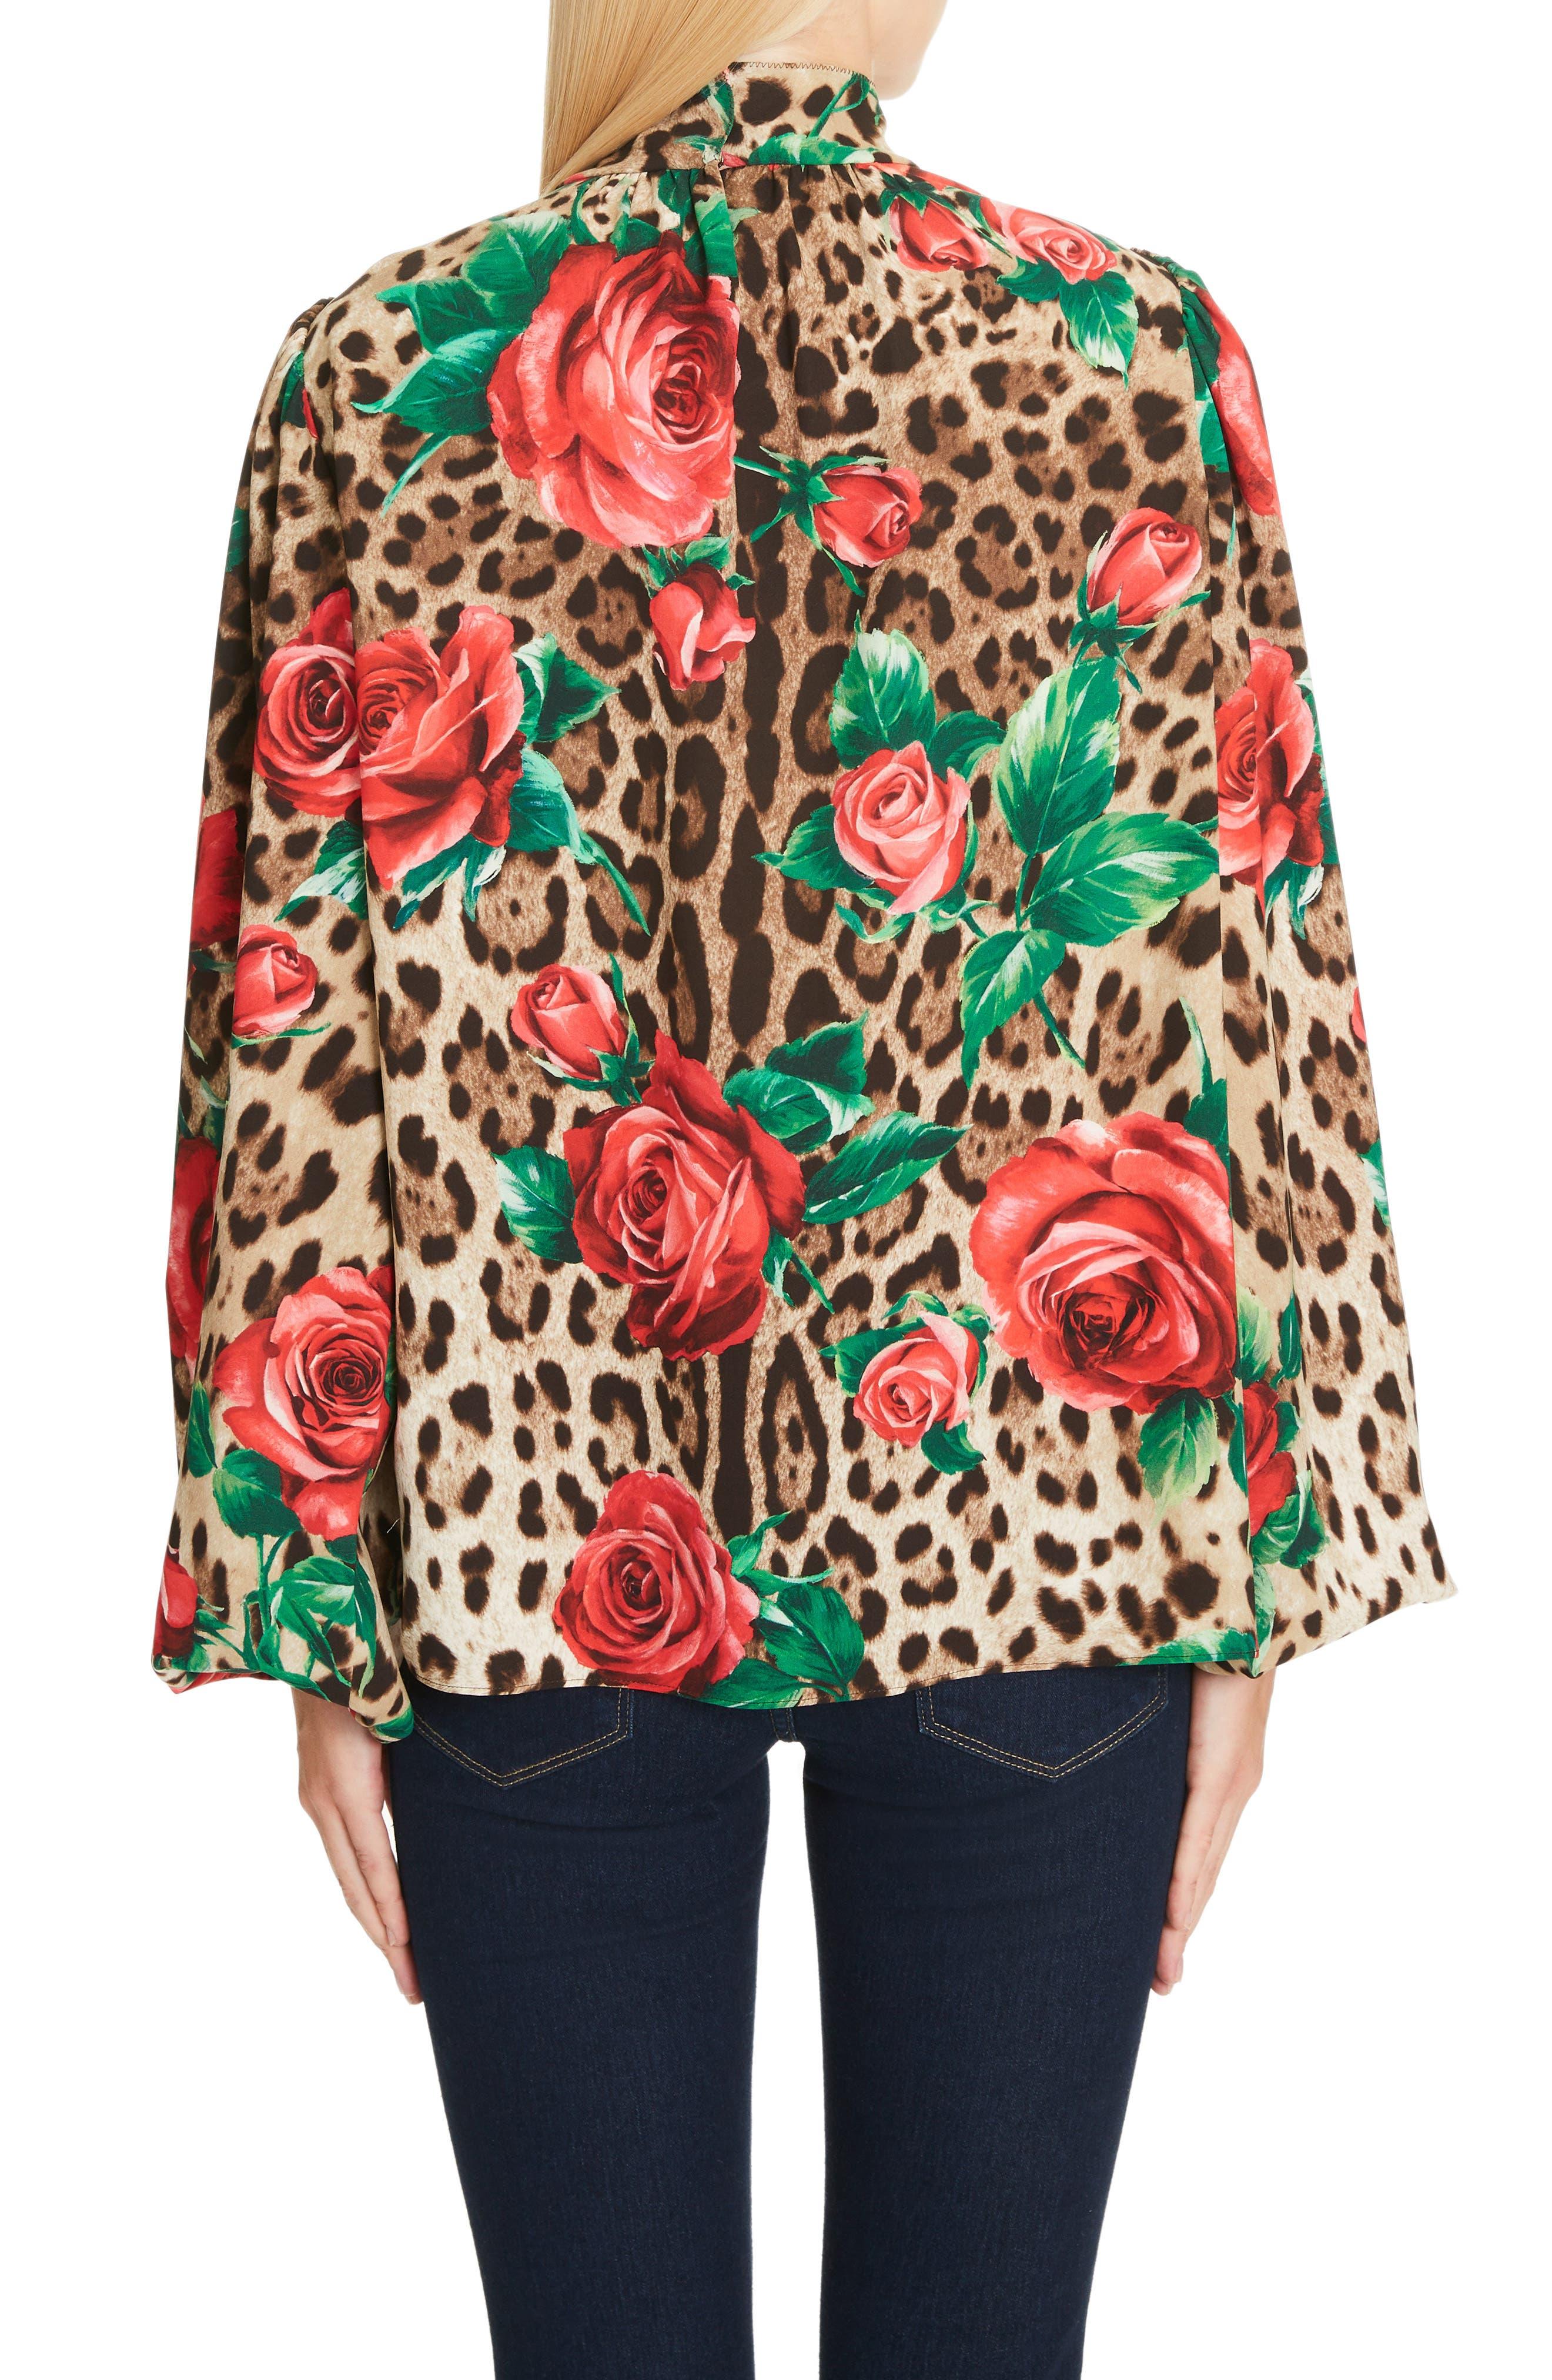 Rose & Leopard Print Tie Neck Stretch Silk Blouse,                             Alternate thumbnail 2, color,                             HKIRS ROSE LEO